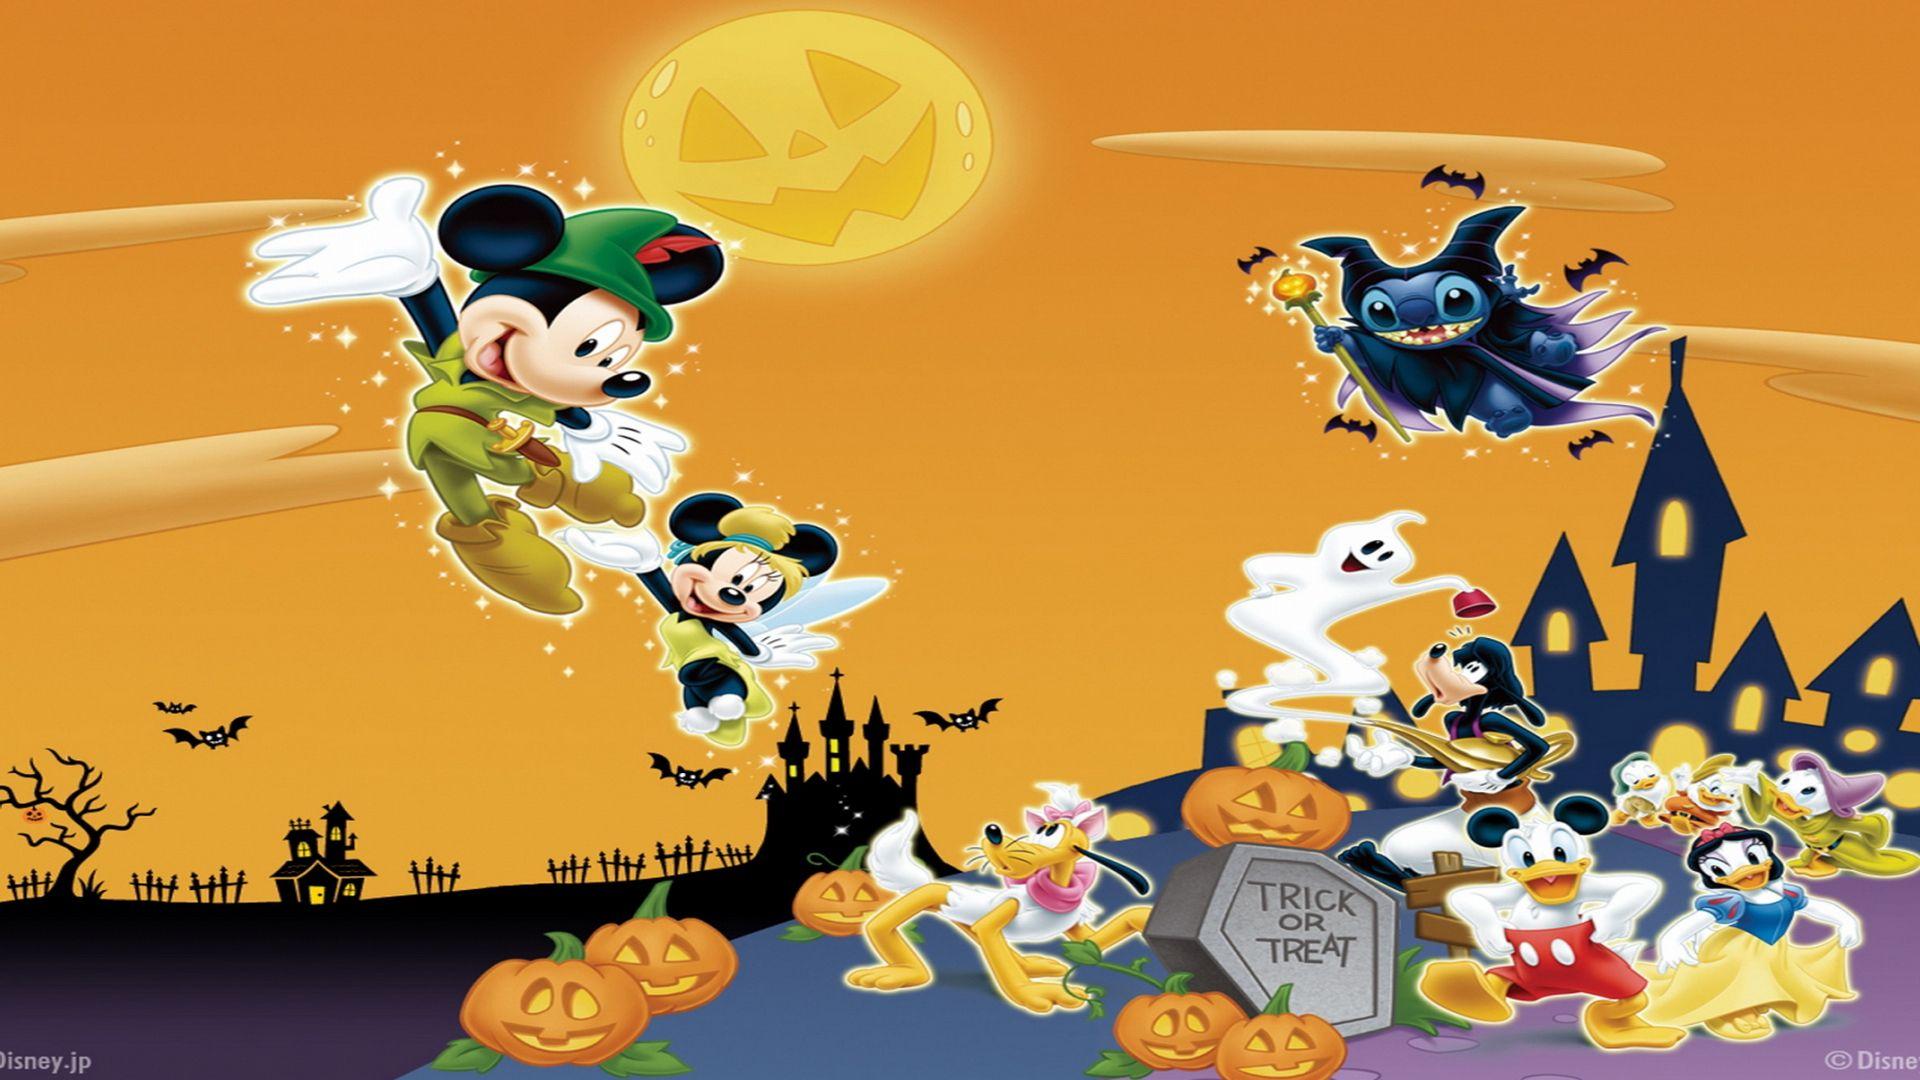 Popular Wallpaper Halloween Mickey Mouse - c0a1738055f9577b1d79eca05c3af69b  Collection_277039.jpg